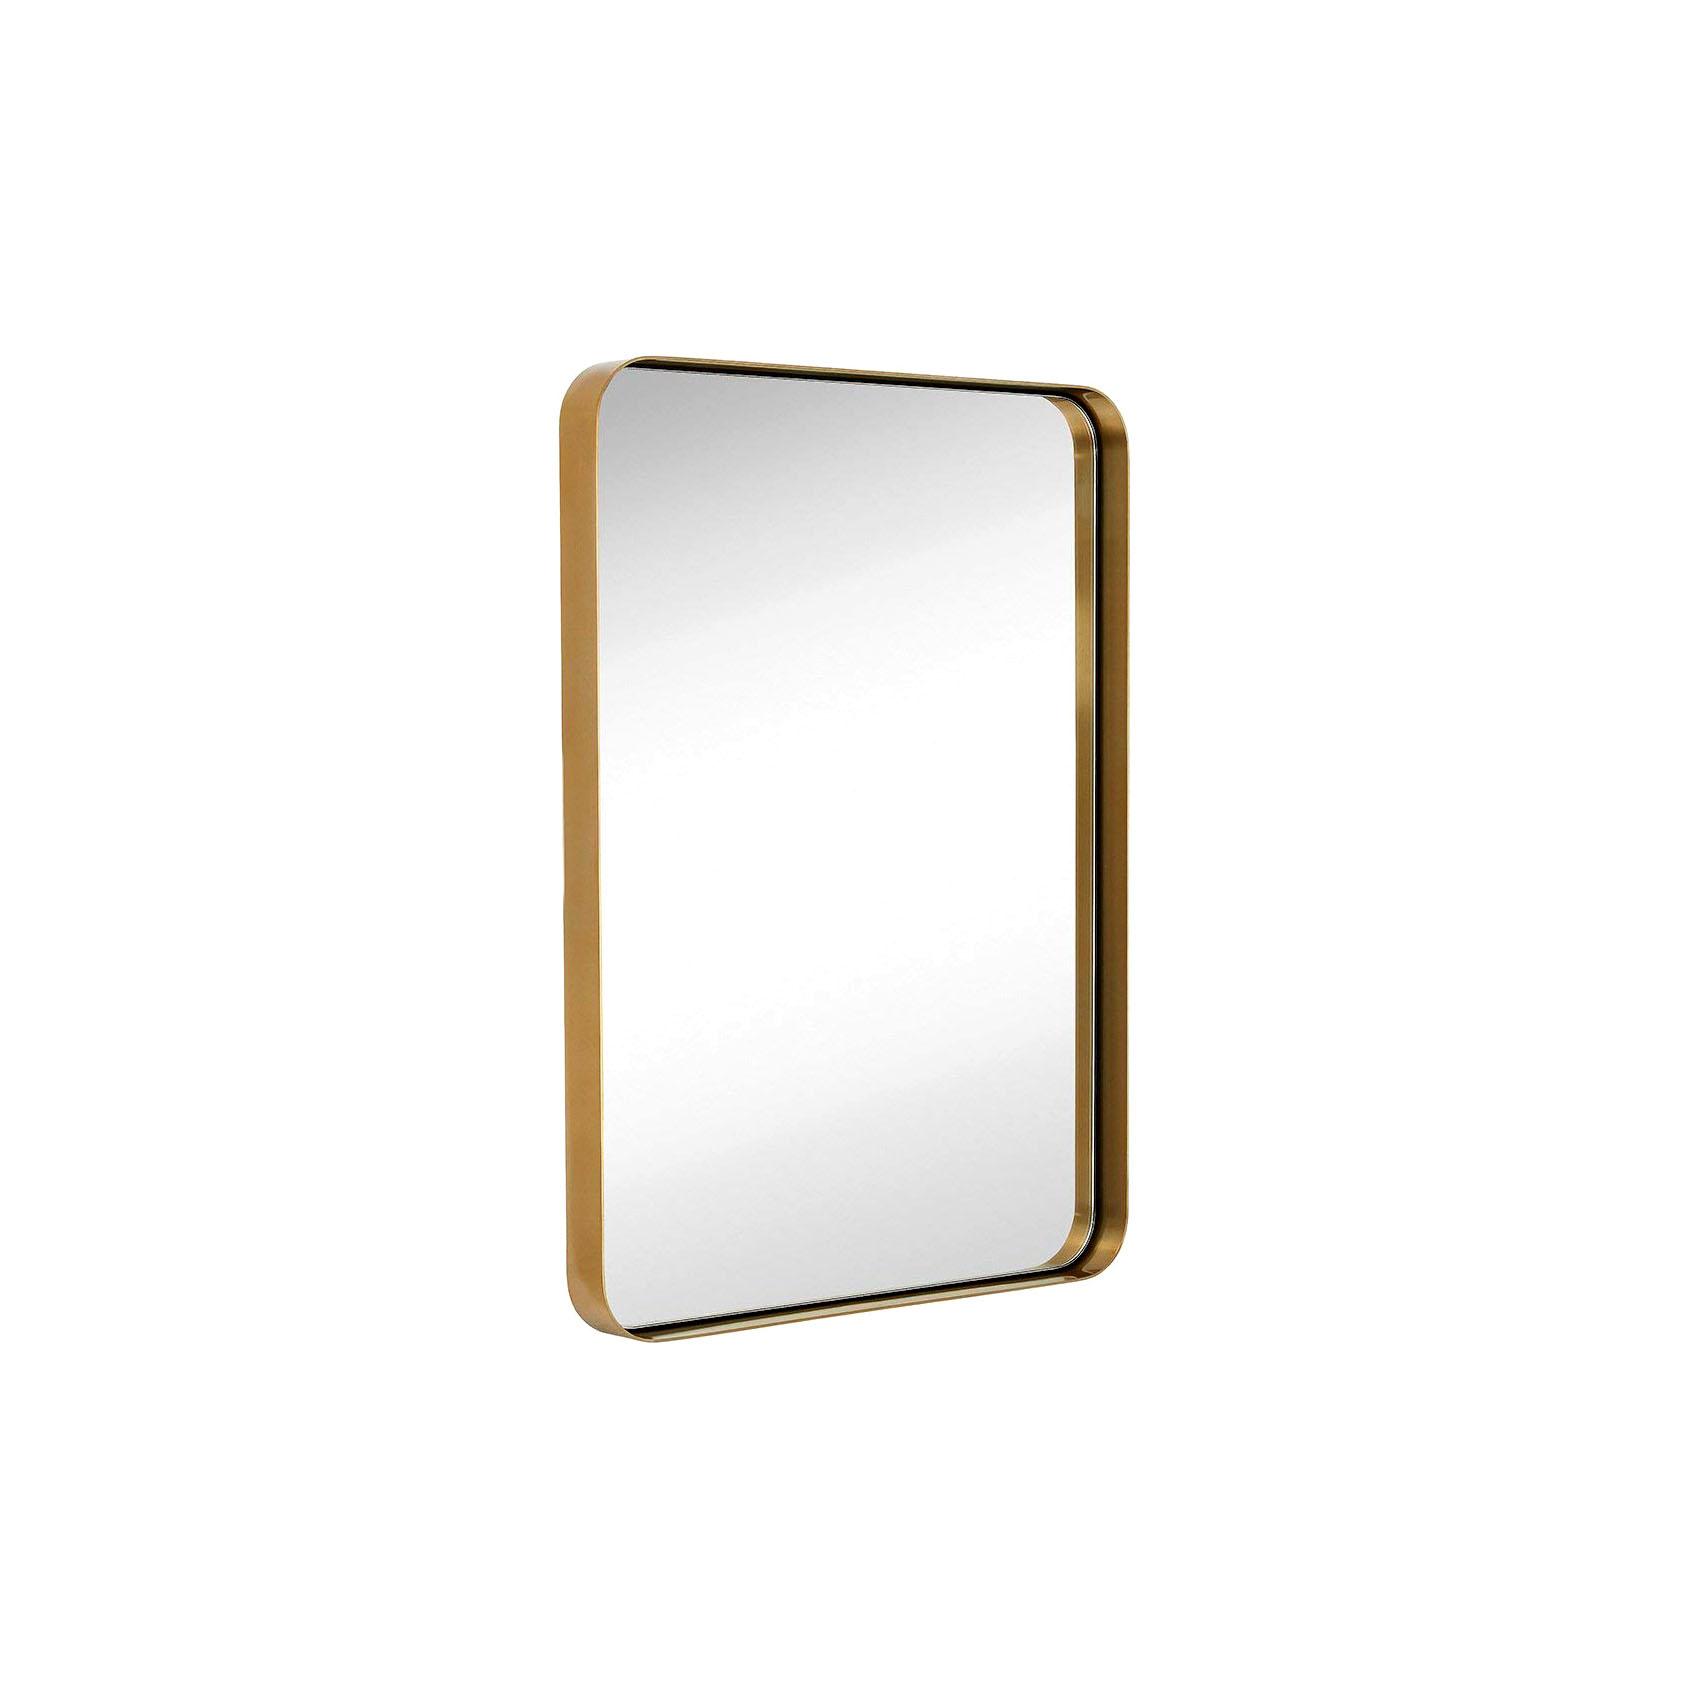 Rectangular Gold Decorative Bathroom Wall Mirror Home Decoration Mirror Buy Design Decorative Wall Mirror Handmade Decorated Mirrors Wall Mirrors Decorative Cheap Product On Alibaba Com